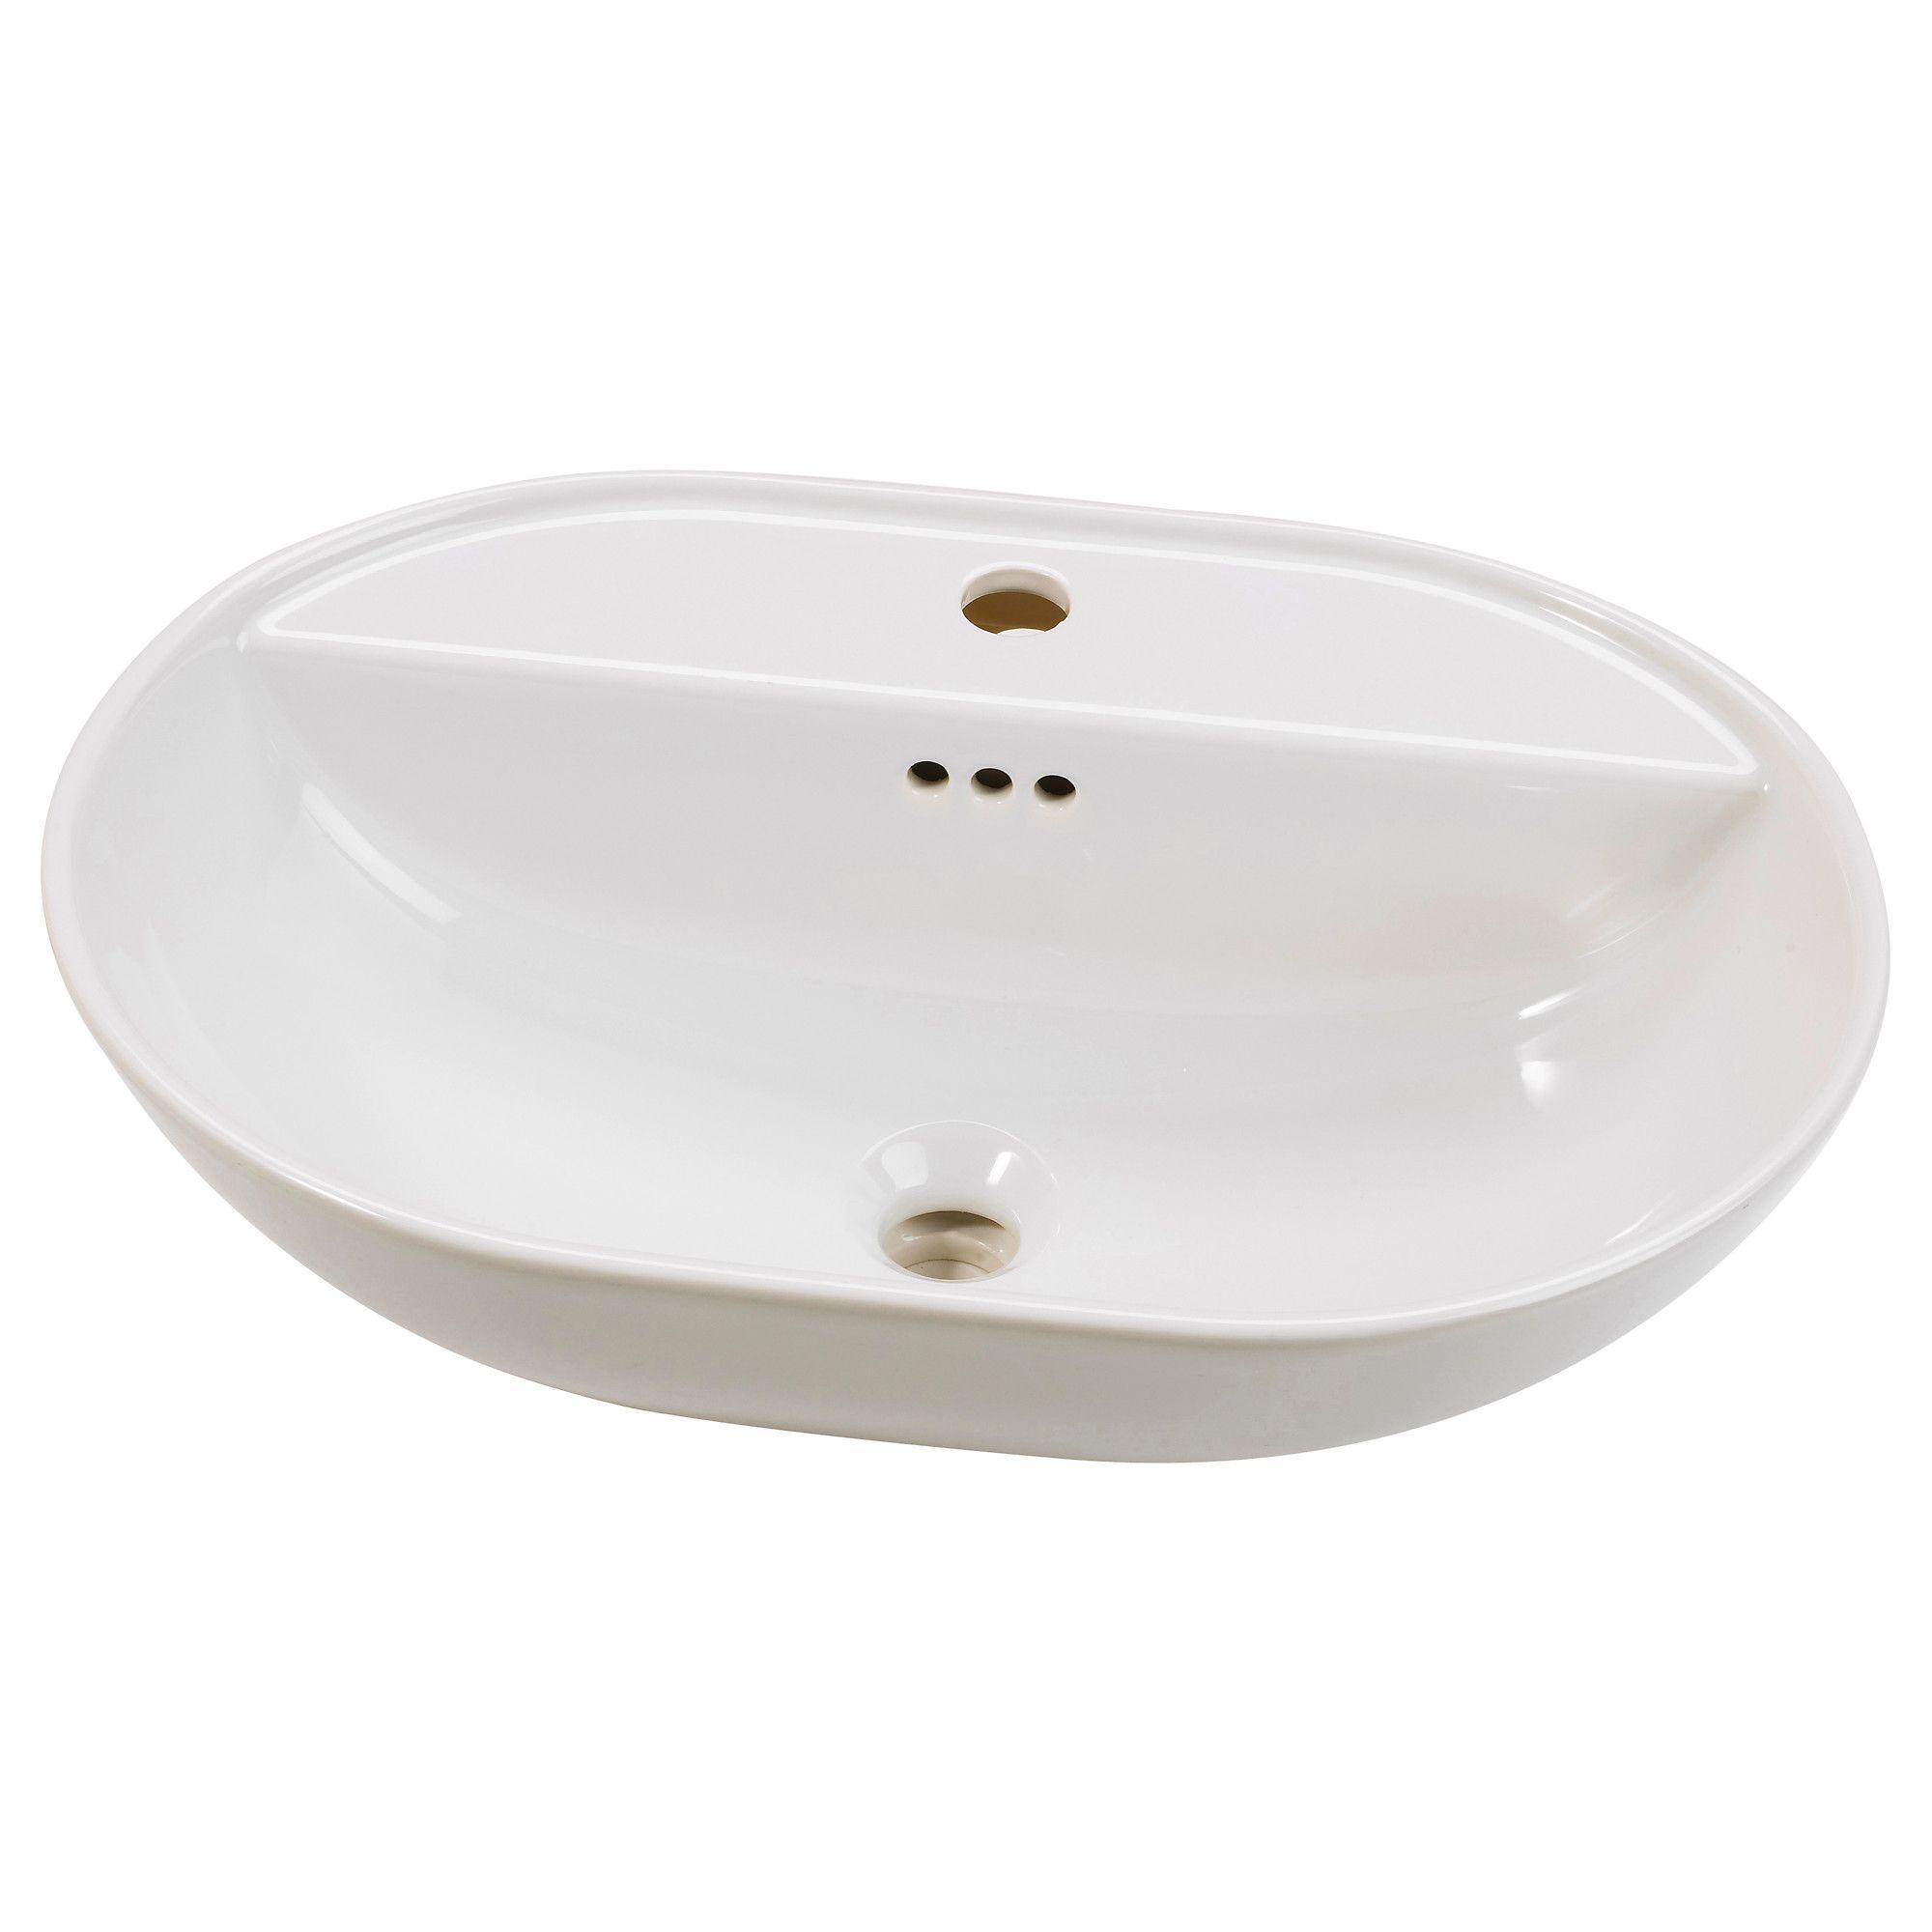 H llviken vask ikea bath - Ikea badezimmermobel ...